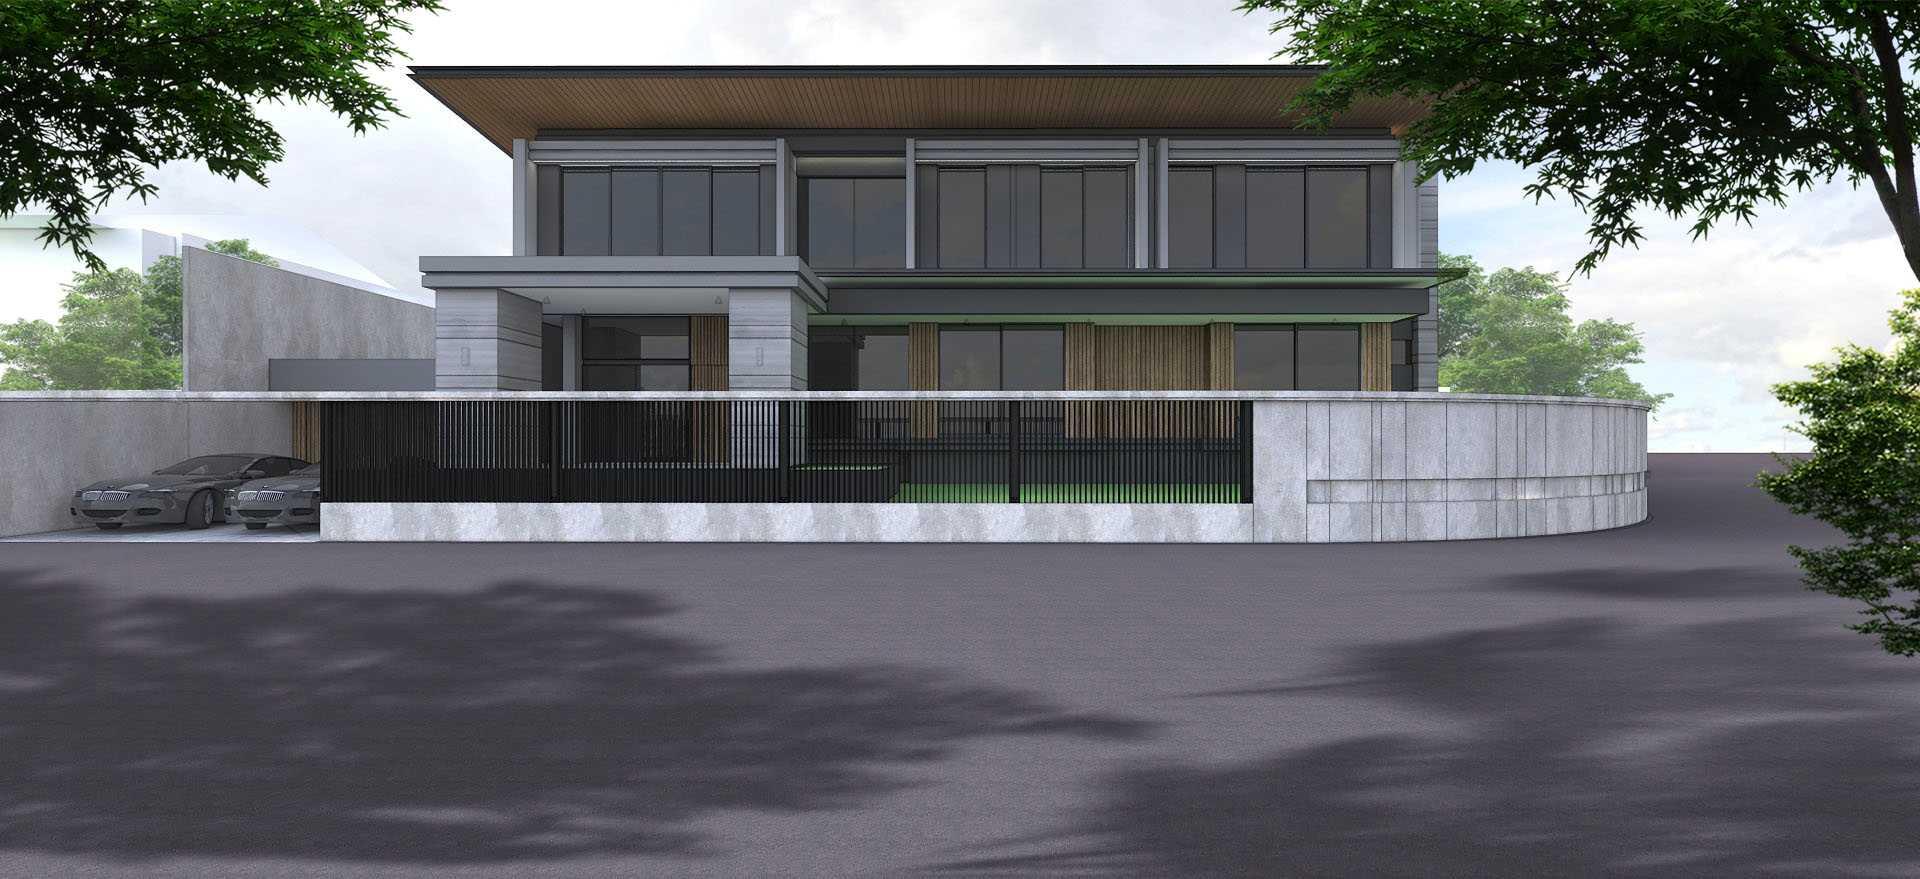 Q Studio R House Tangerang, Kota Tangerang, Banten, Indonesia Tangerang, Kota Tangerang, Banten, Indonesia Q-Studio-R-House  120354